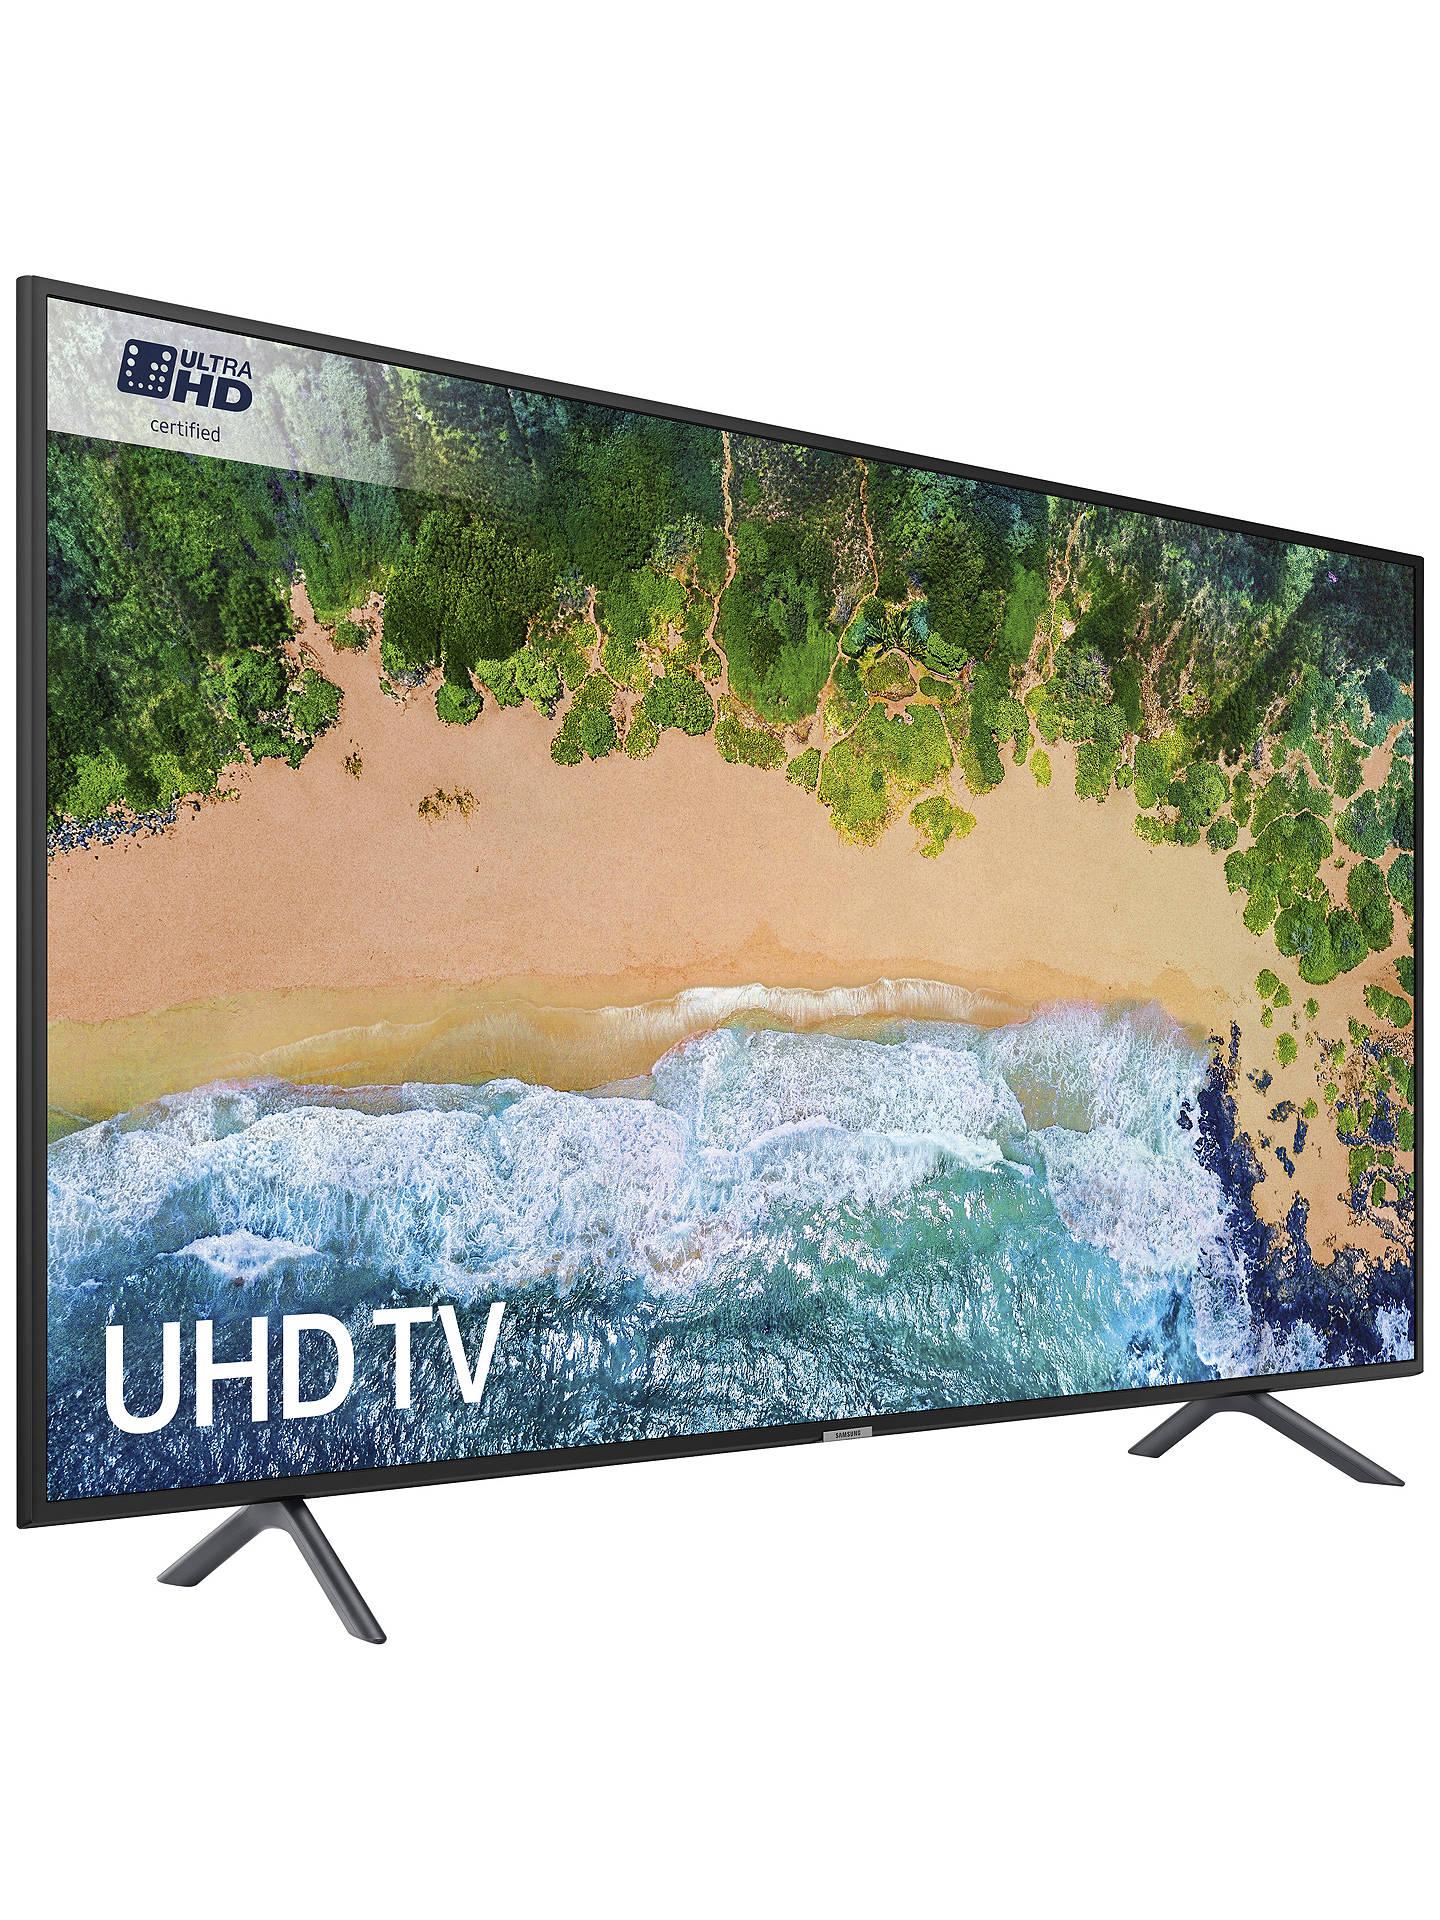 Samsung UE55NU7100 HDR 4K Ultra HD Smart TV, 55